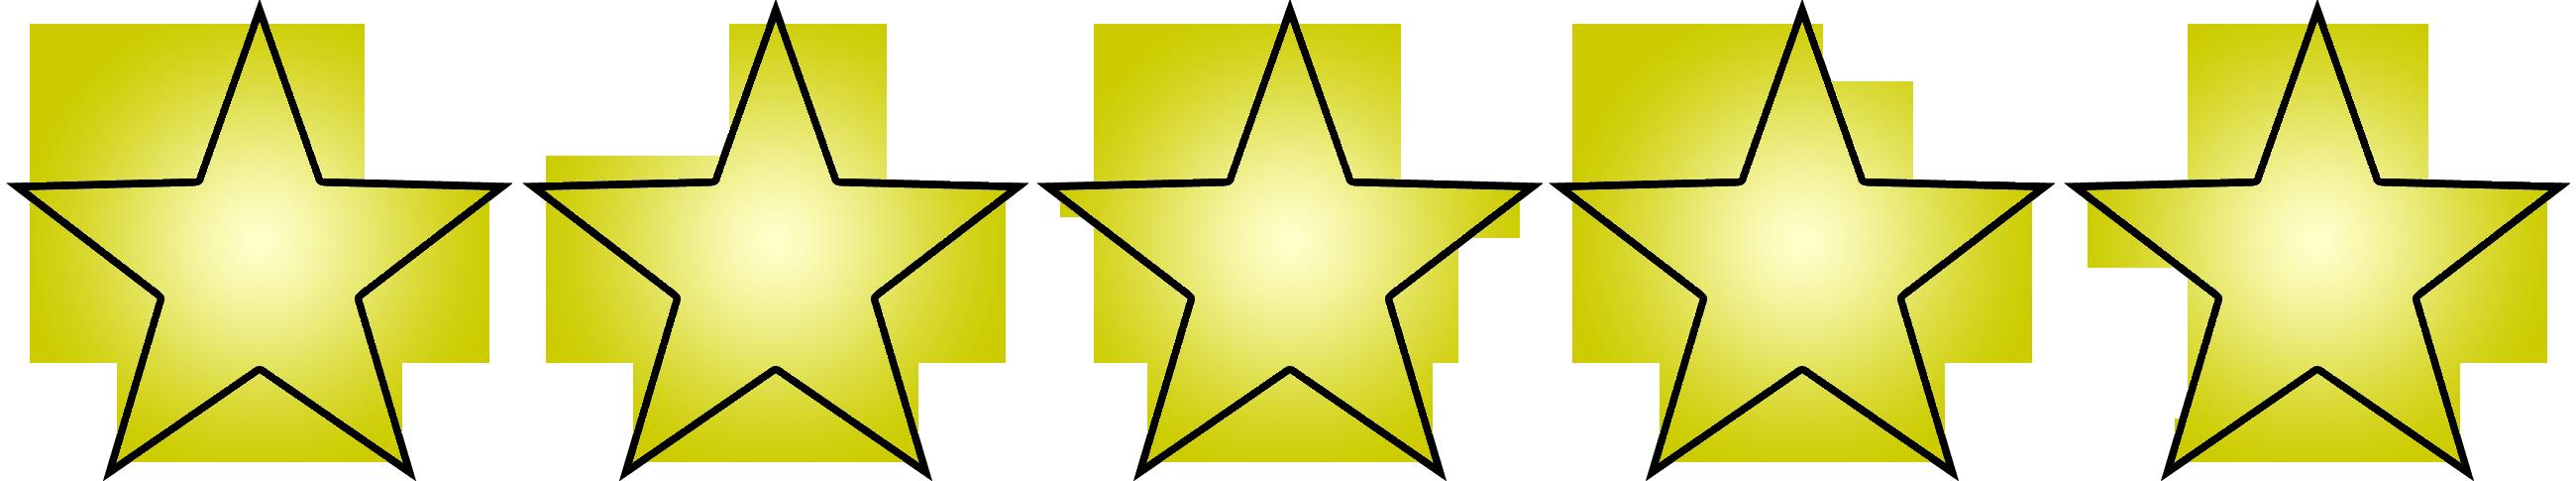 5 Star Rating